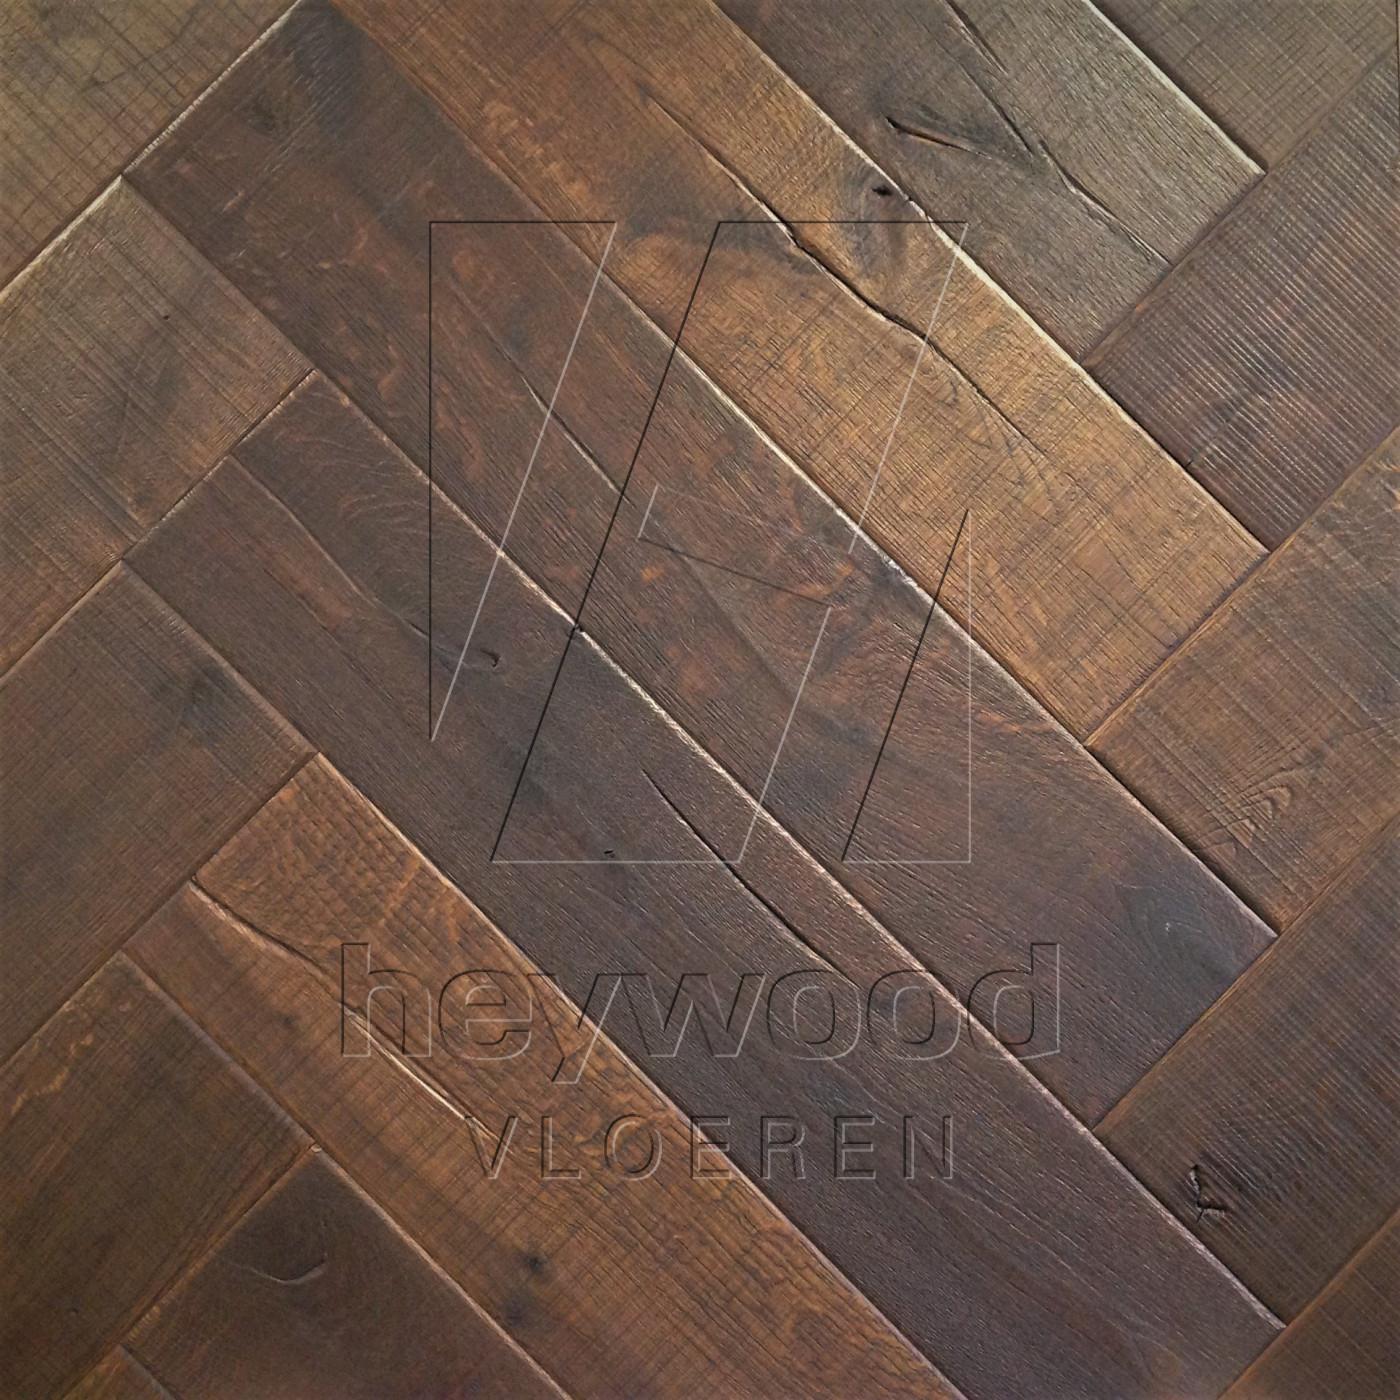 Knotting Hill Herringbone 'Yorkshire' in Herringbone of Pattern & Panel Floors